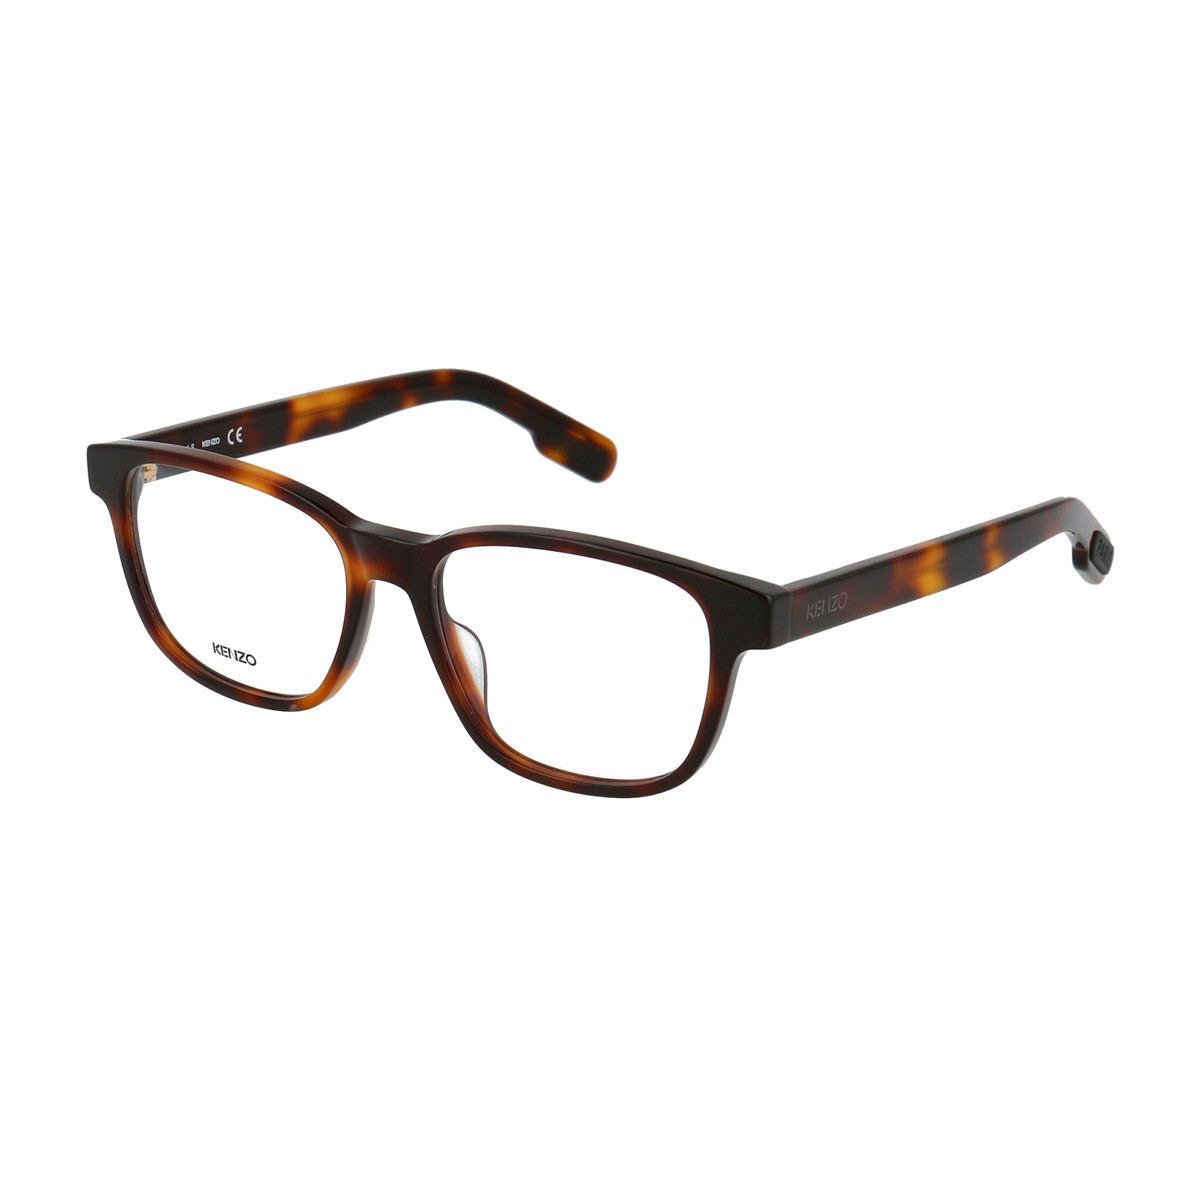 Kenzo KZ50026I | Occhiali da vista Unisex